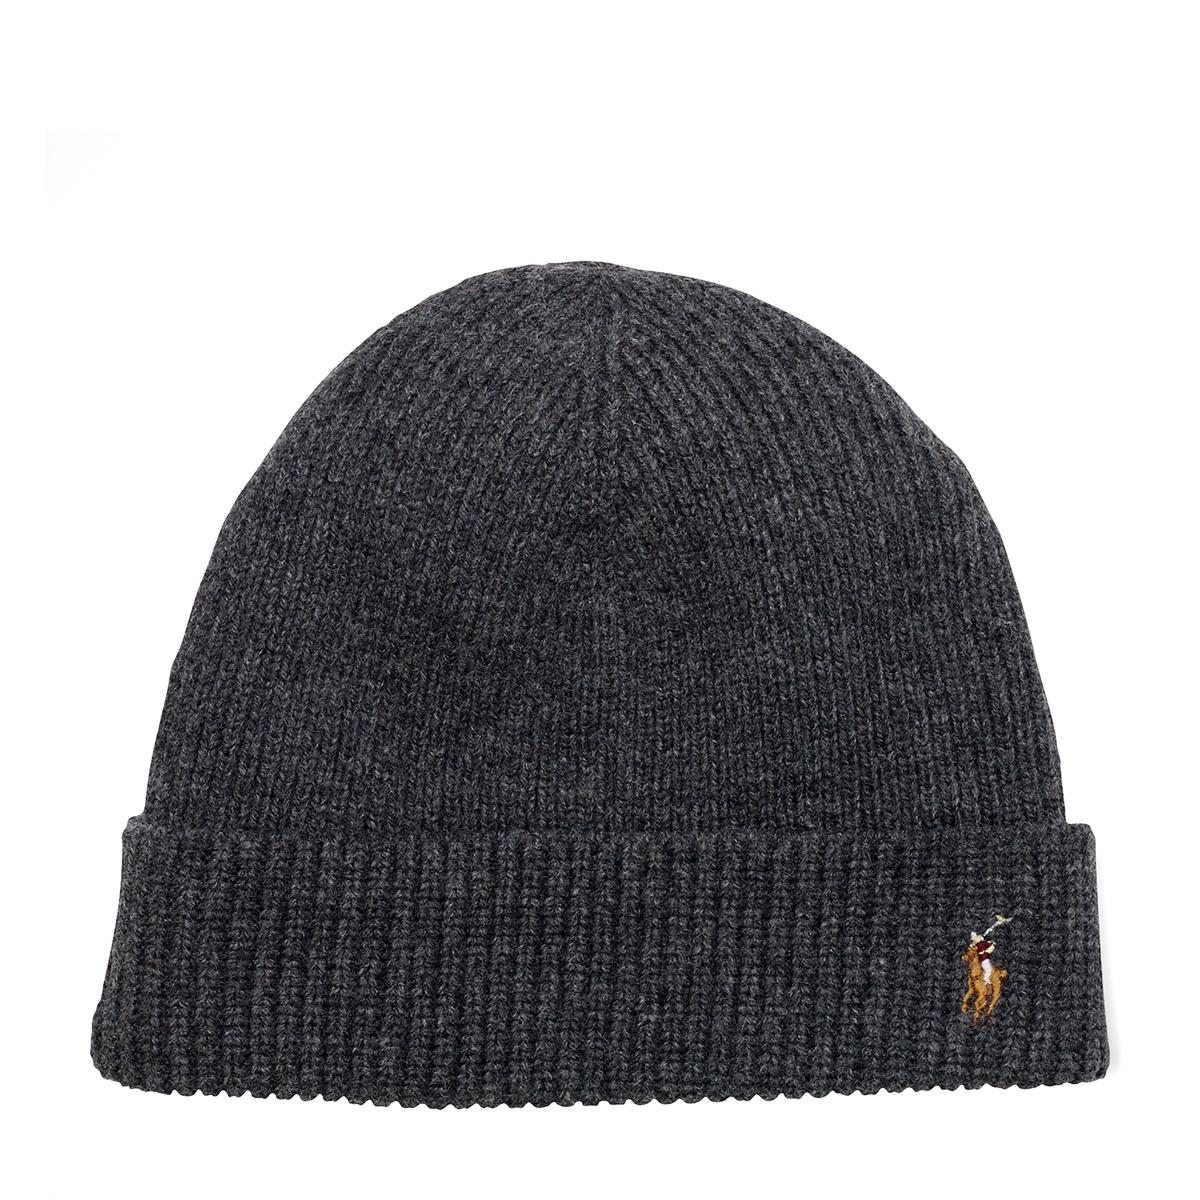 cca38a77b Signature Merino Cuff Hat | Hats Hats, Scarves & Gloves | Ralph Lauren